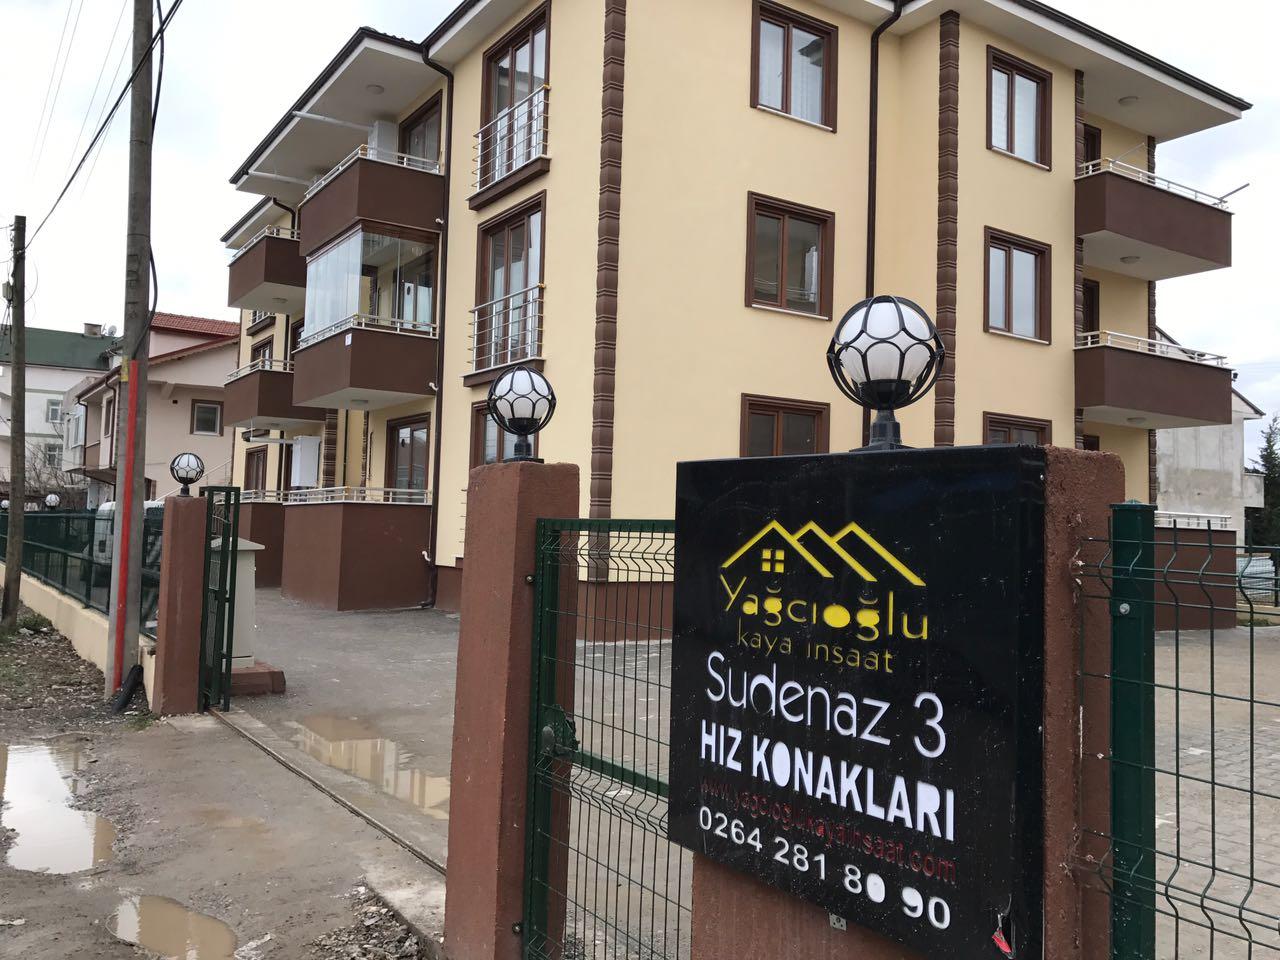 http://www.yagcioglukayainsaat.com/wp-content/uploads/Sudenaz-3-Yazlık-5.jpeg